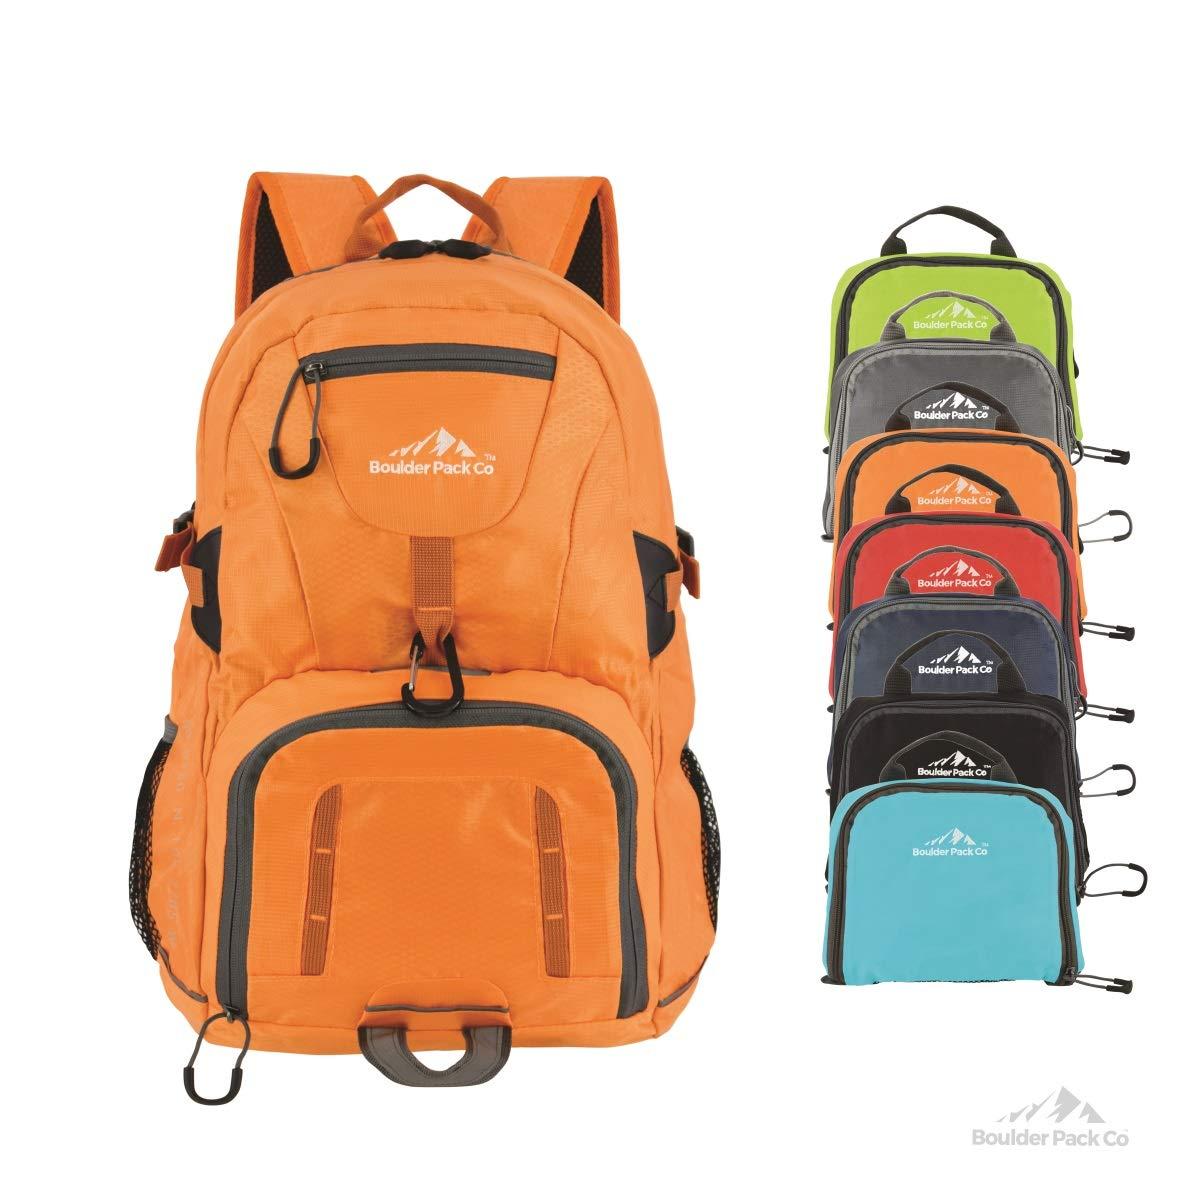 Boulder Pack Company Lightweight Foldable Travel Hiking Daypack Backpack